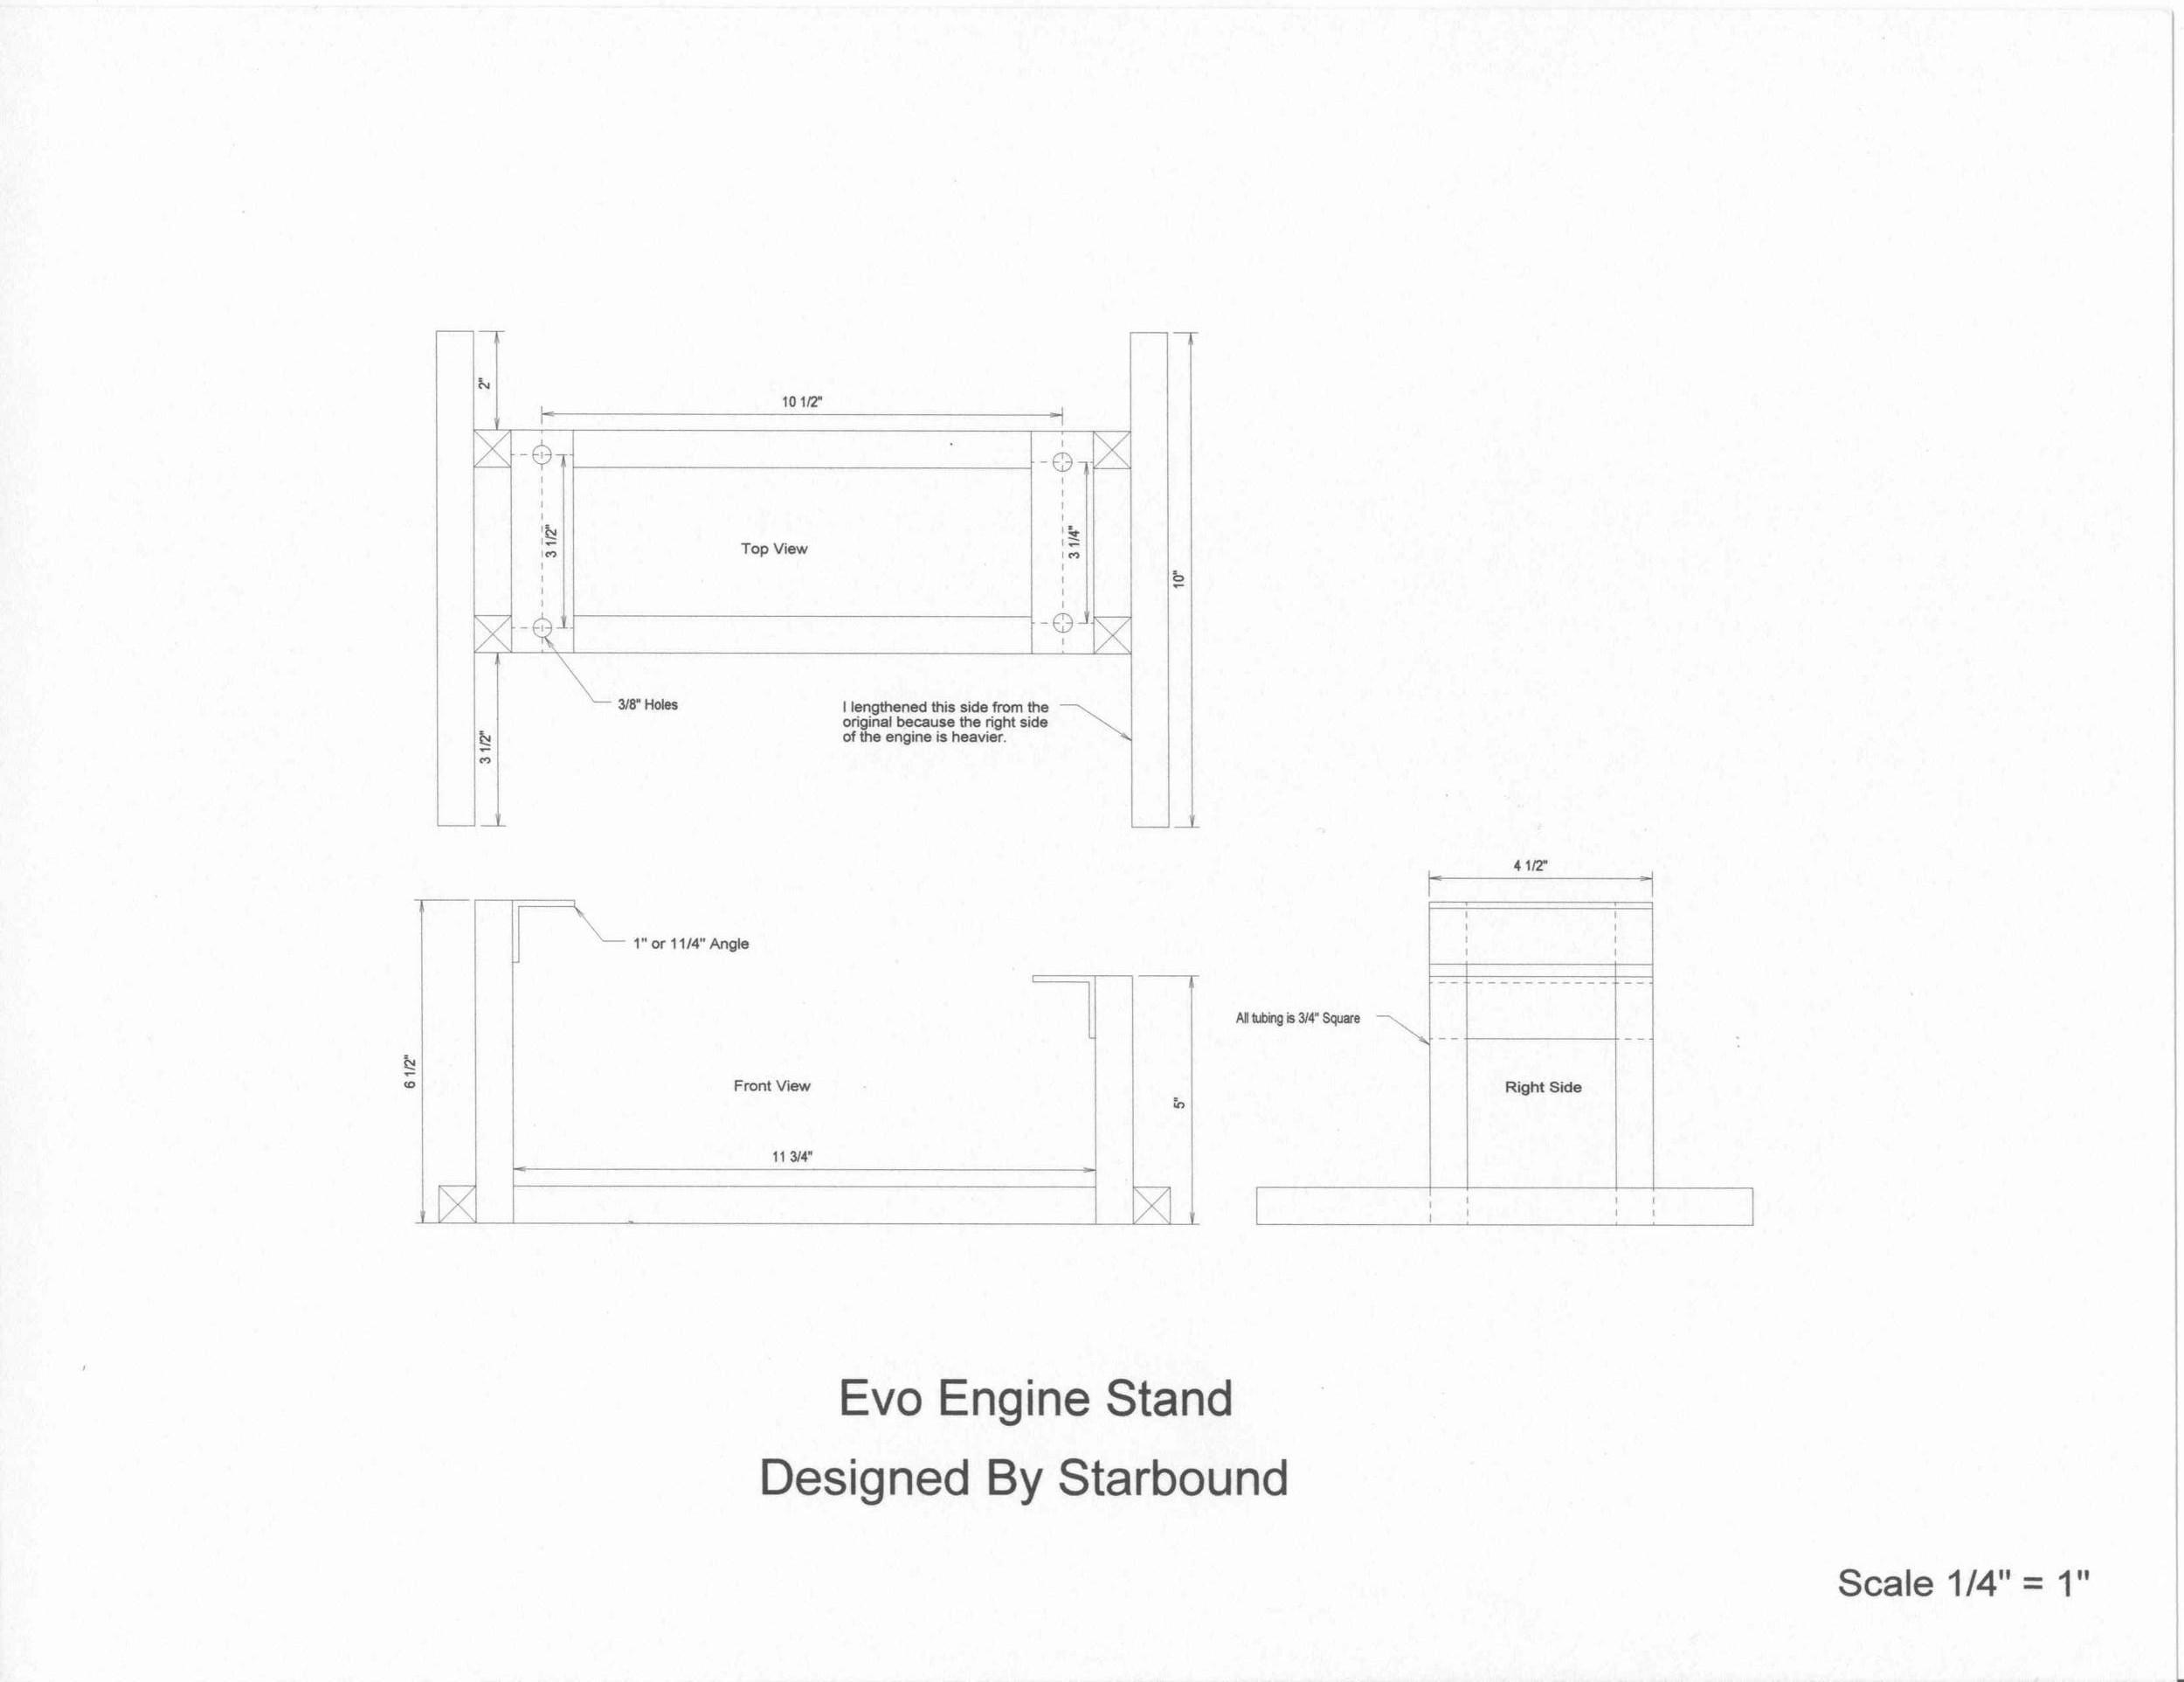 80 Harley Evolution Engine Diagram Trusted Wiring Shovelhead Diagrams Plans For A Motor Stand Mustaribrand Art